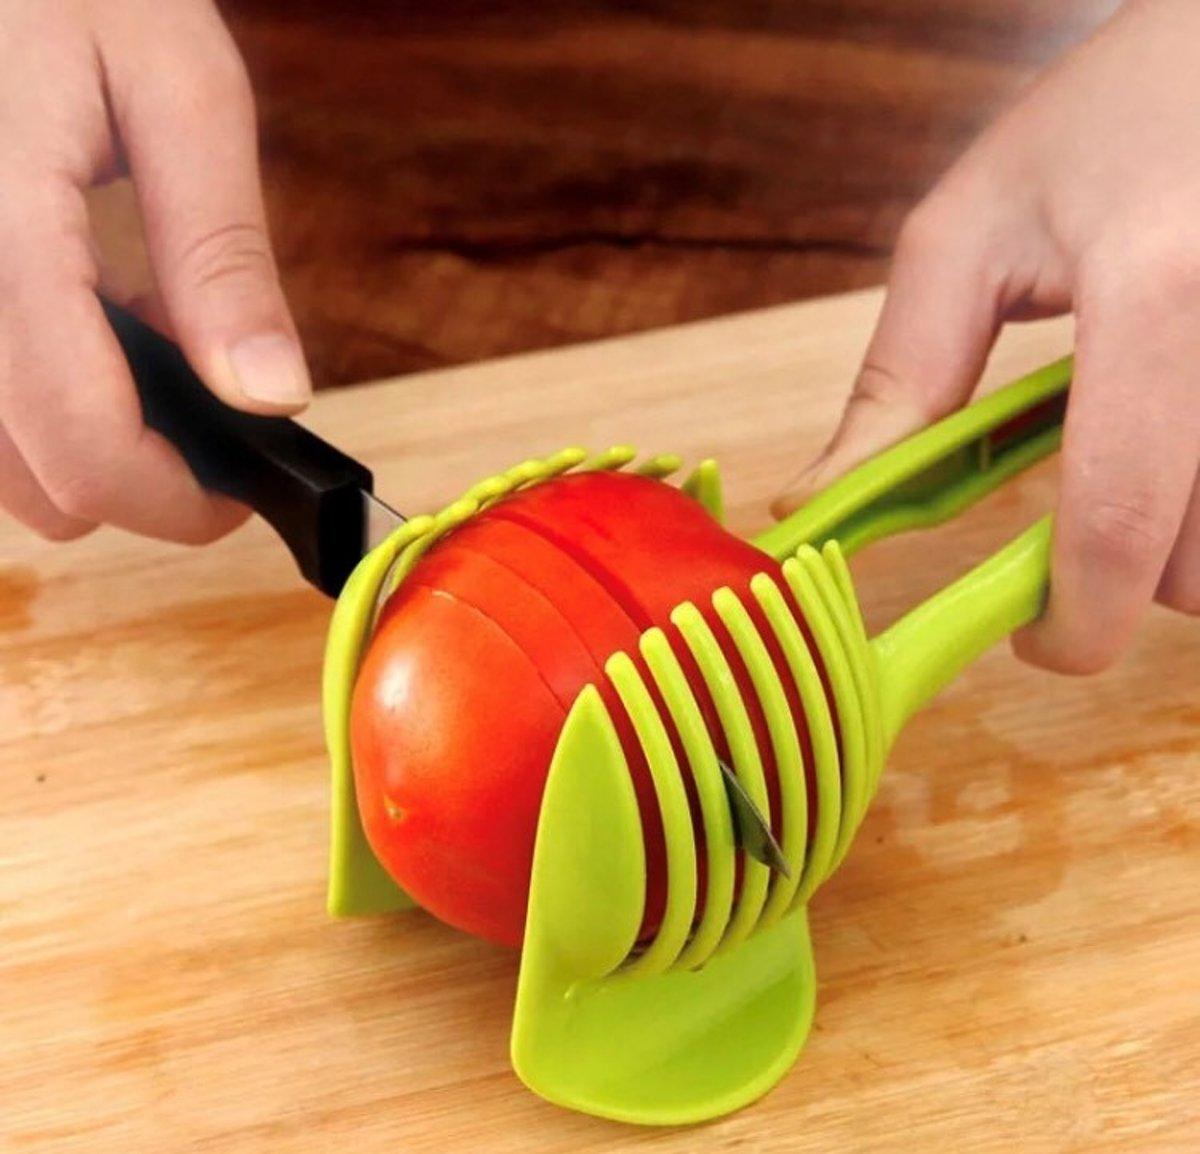 Tomatensnijder - Groetensnijder - Eiersnijder - Keukengerei - fruitsnijder kopen